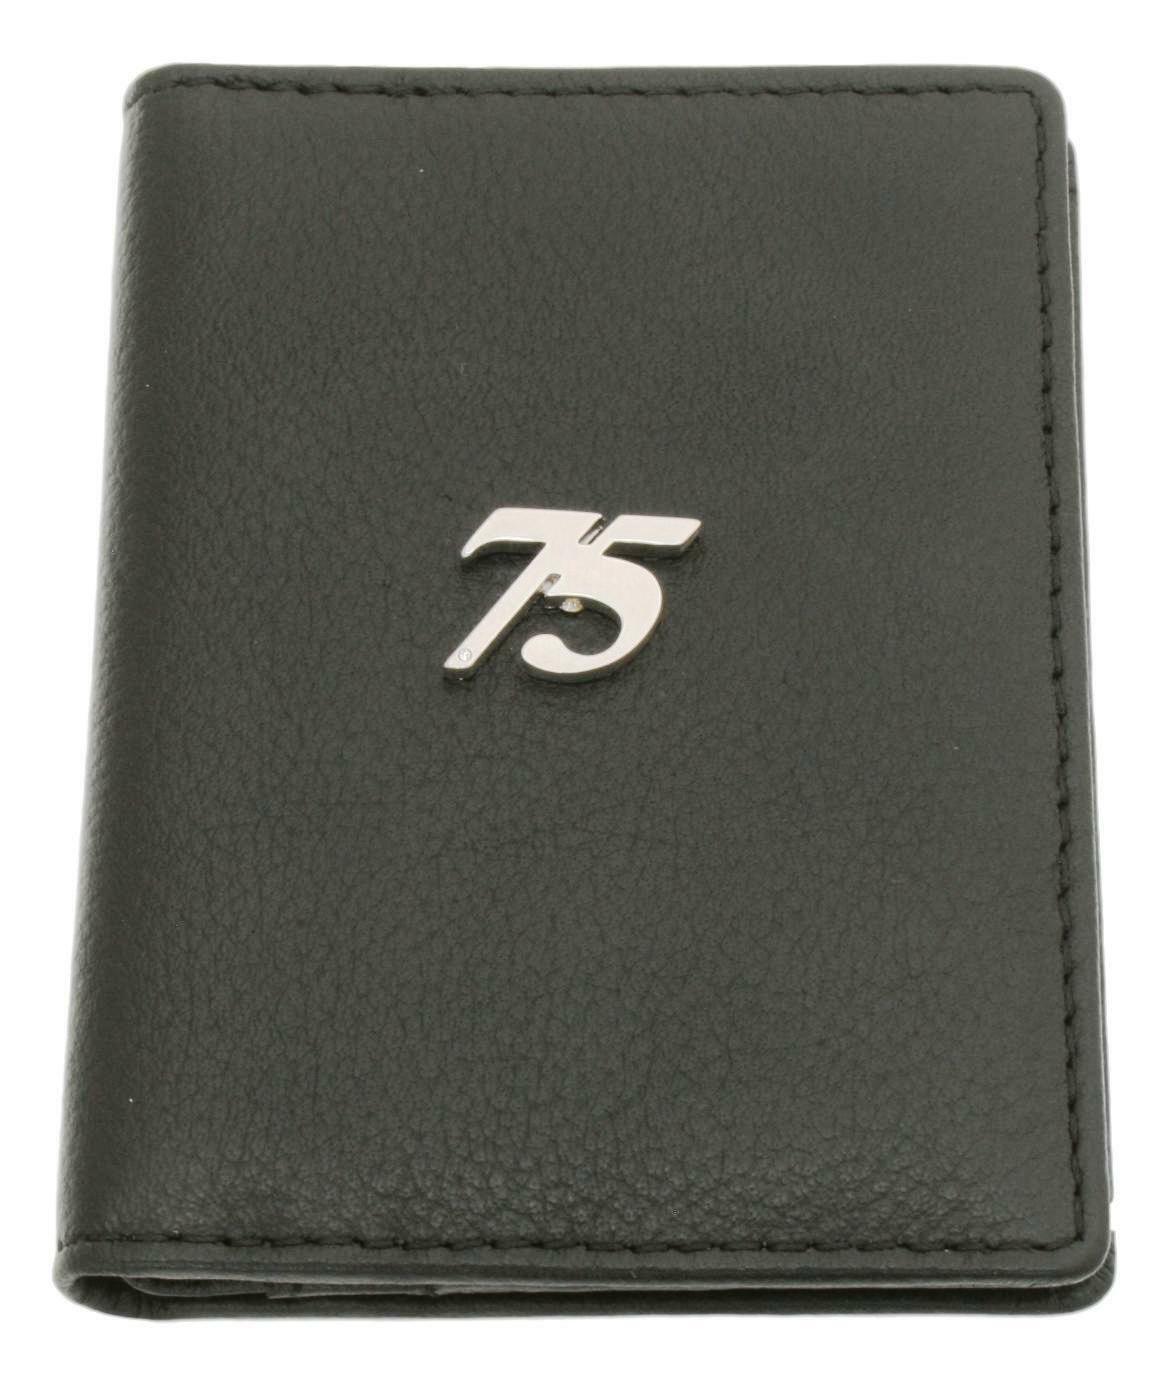 75th Birthday Bifold Card Holder Leather Black Wallet RFID Safe 533